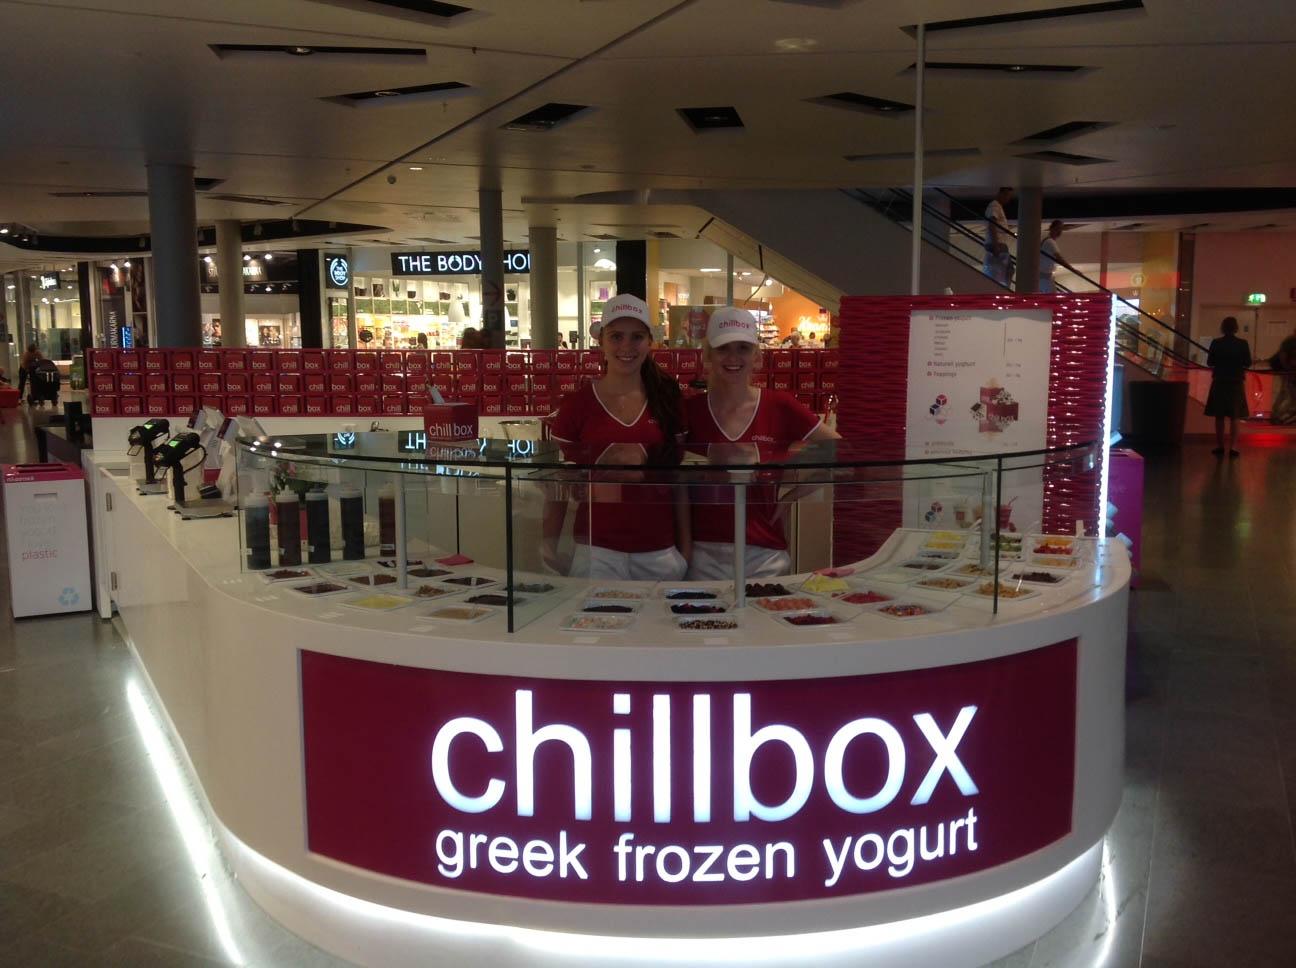 H Chillbox επεκτείνεται σε Ρωσία, Αυστρία και Ουγγαρία